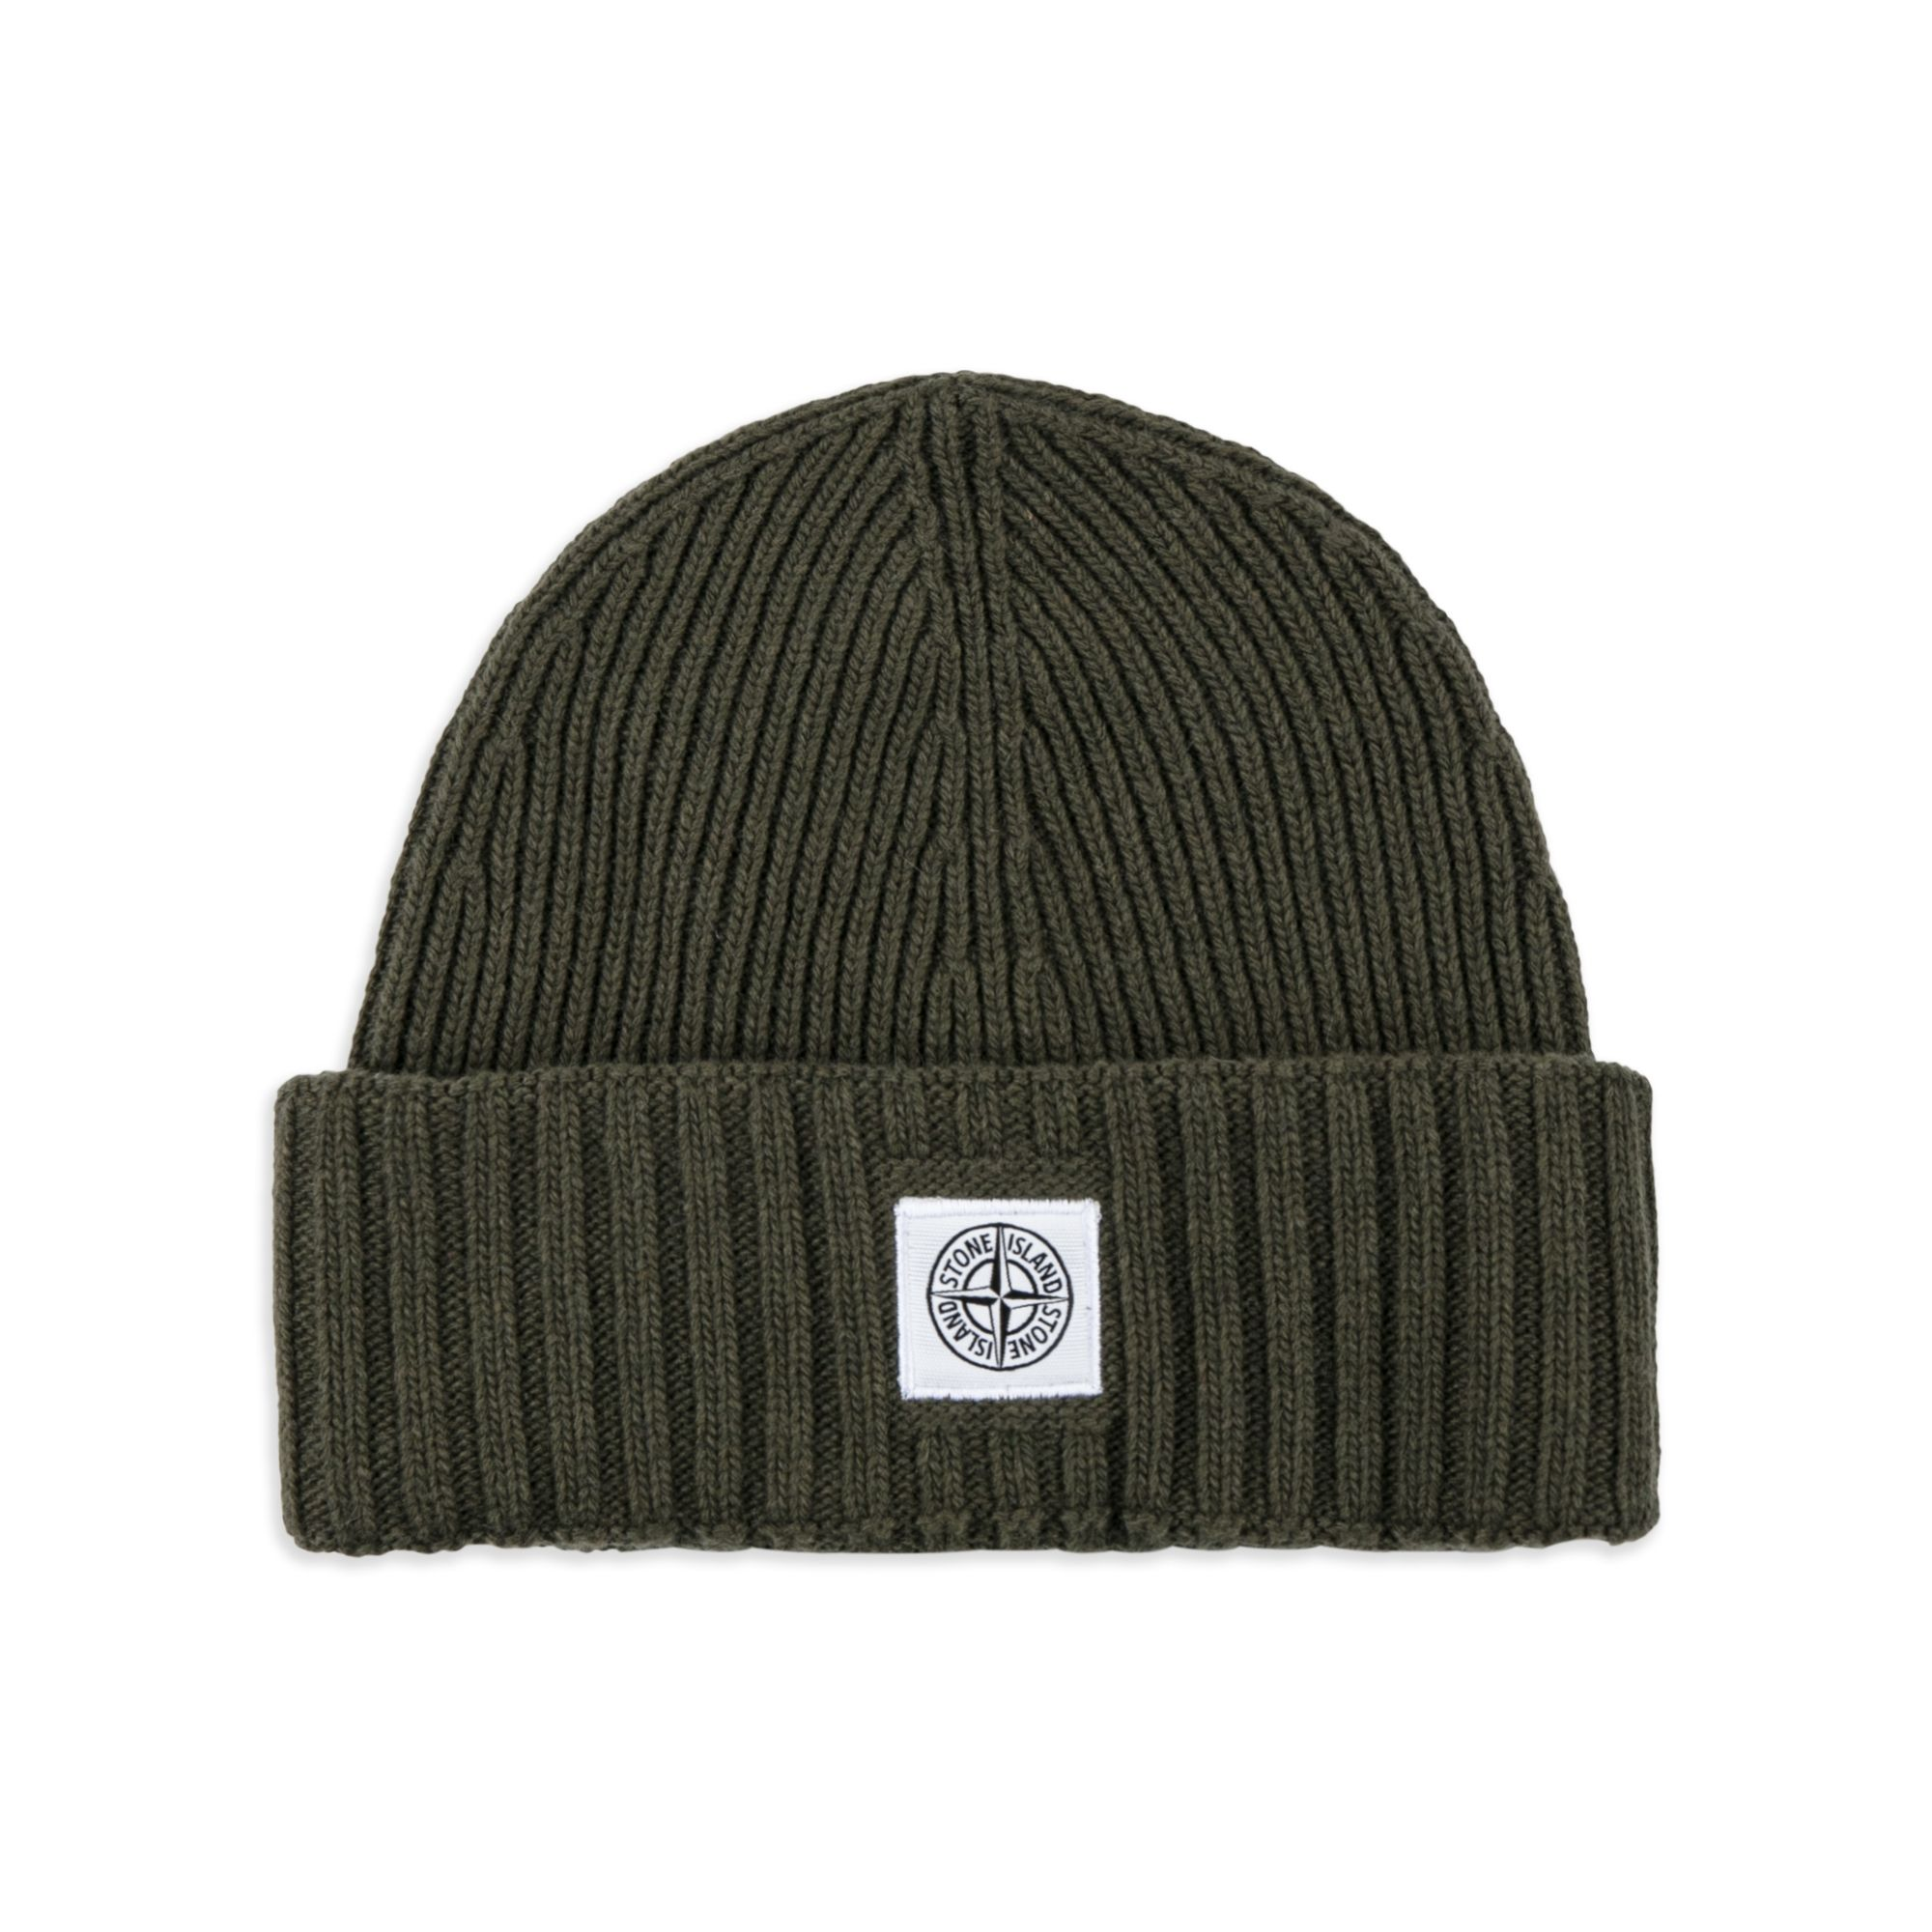 Ribbed-knit wool beanie hat Stone Island q3wJ921jE